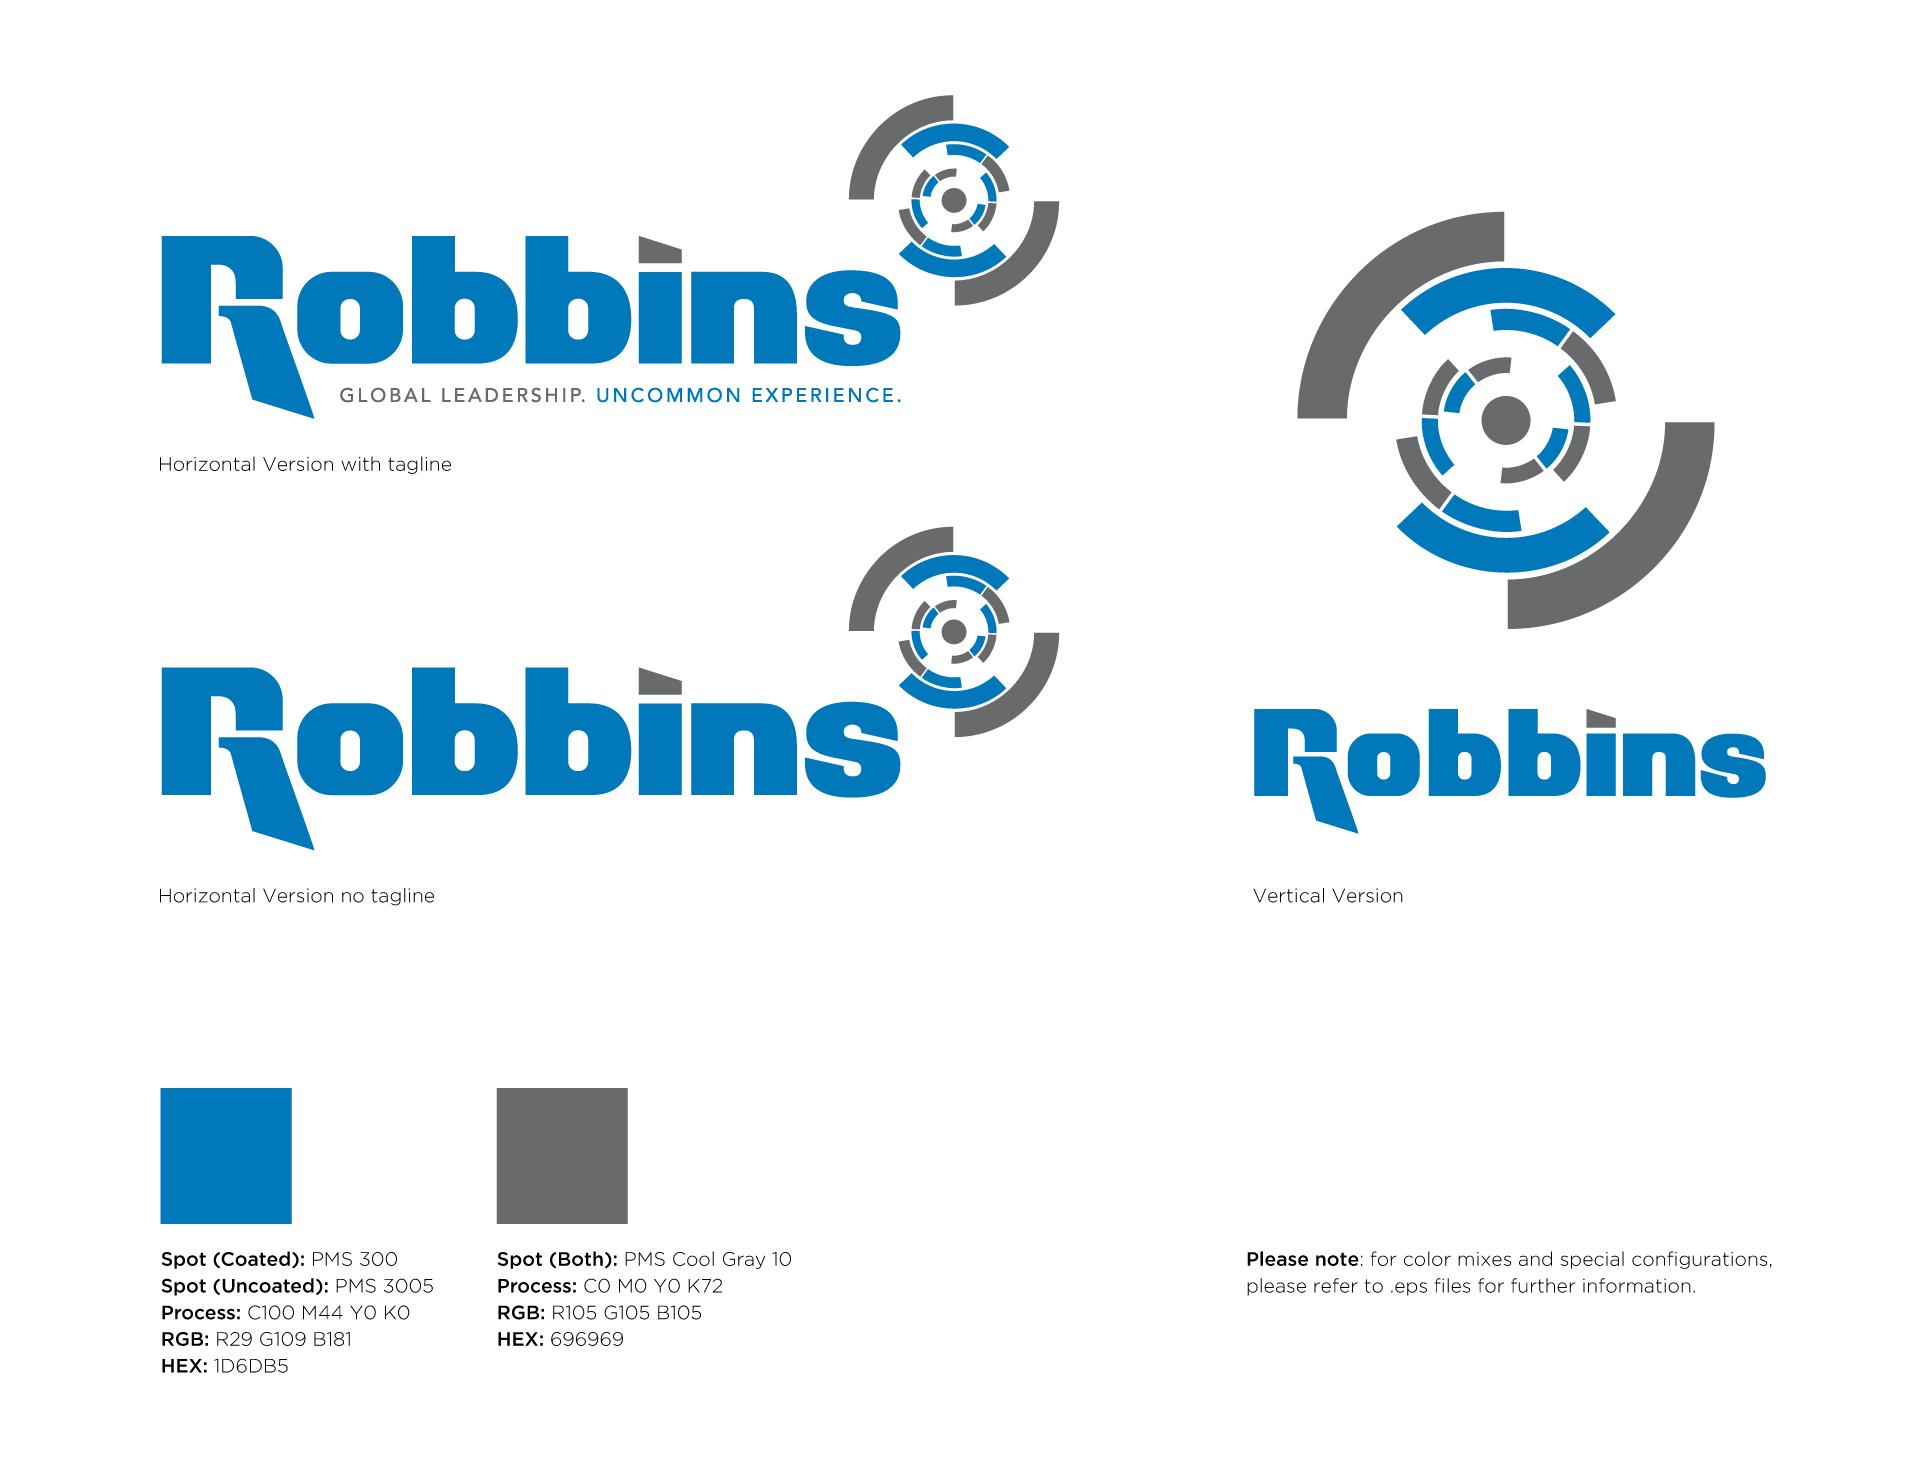 robbins_guide_3